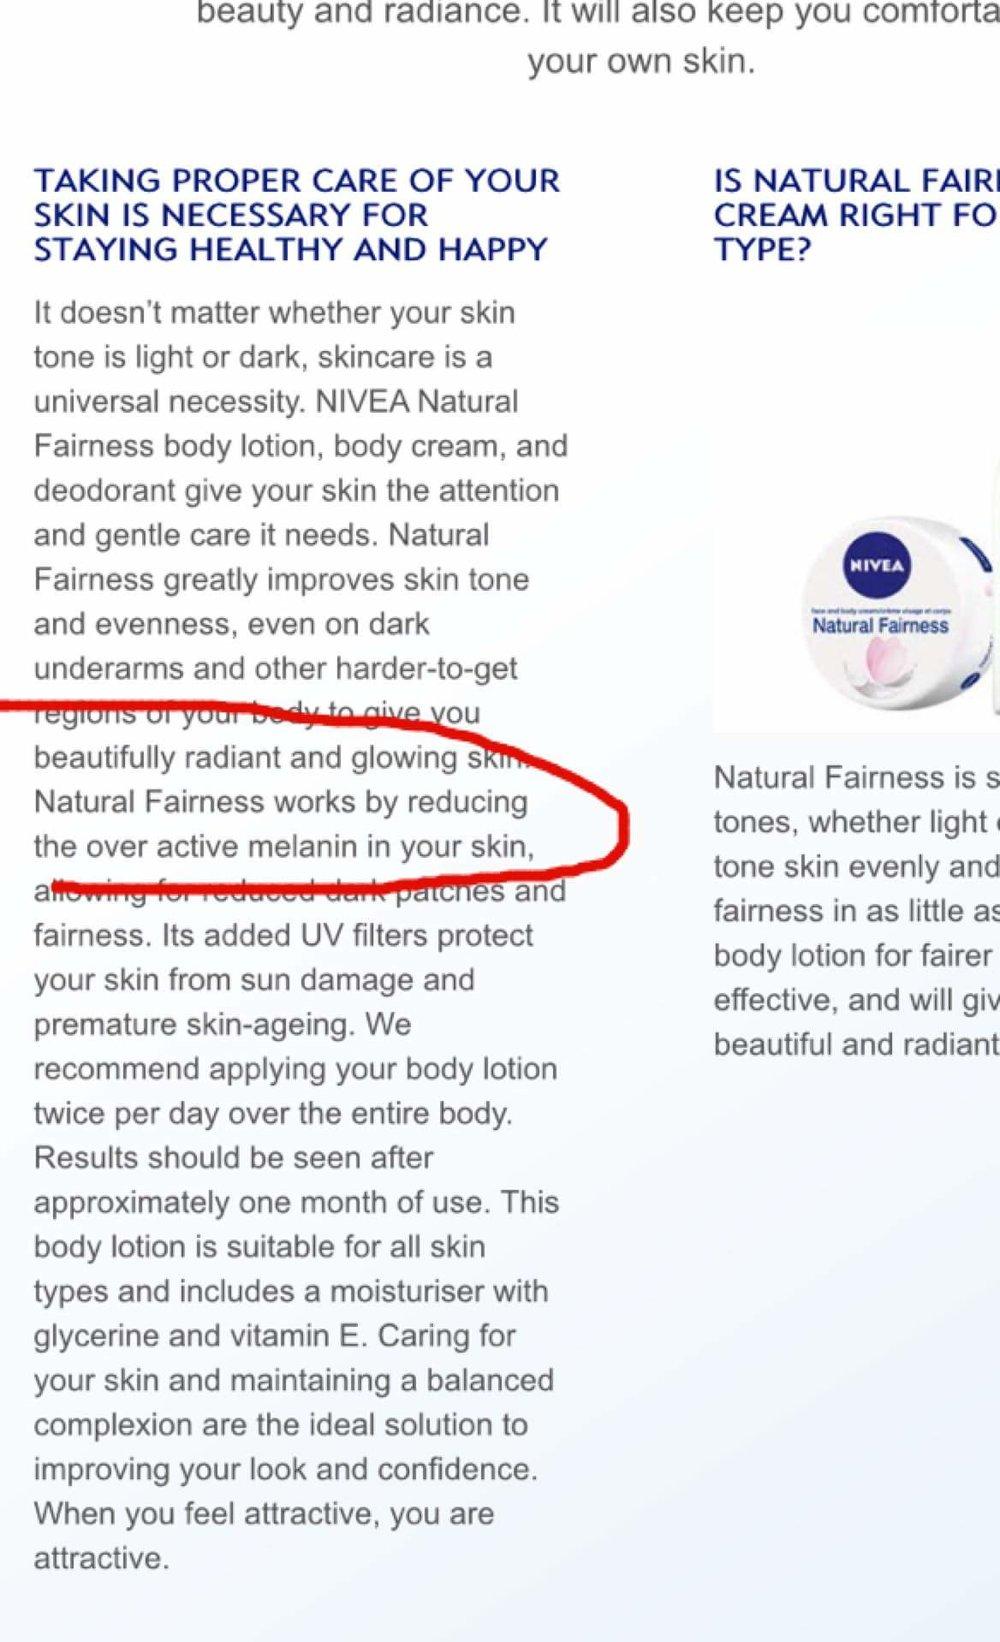 From Nivea Ghana FAQ page.